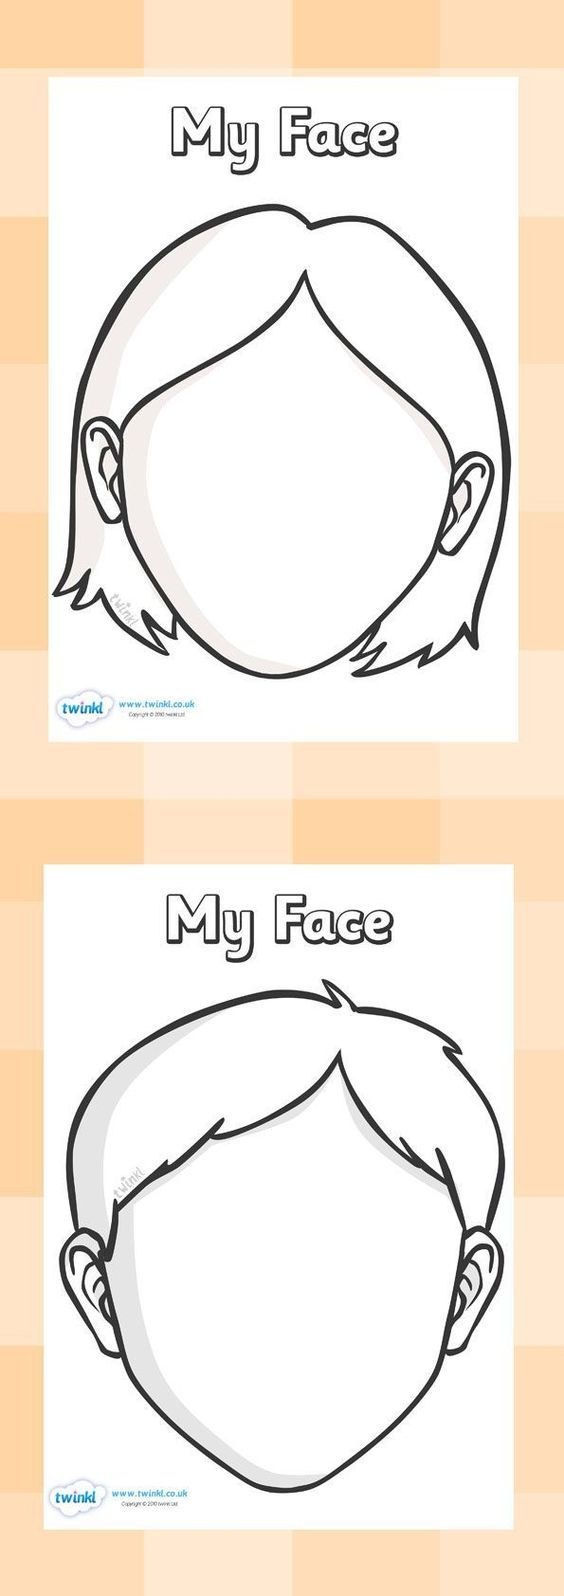 Blank Face Template Pack Face Template All About Me Preschool Preschool [ 1596 x 564 Pixel ]